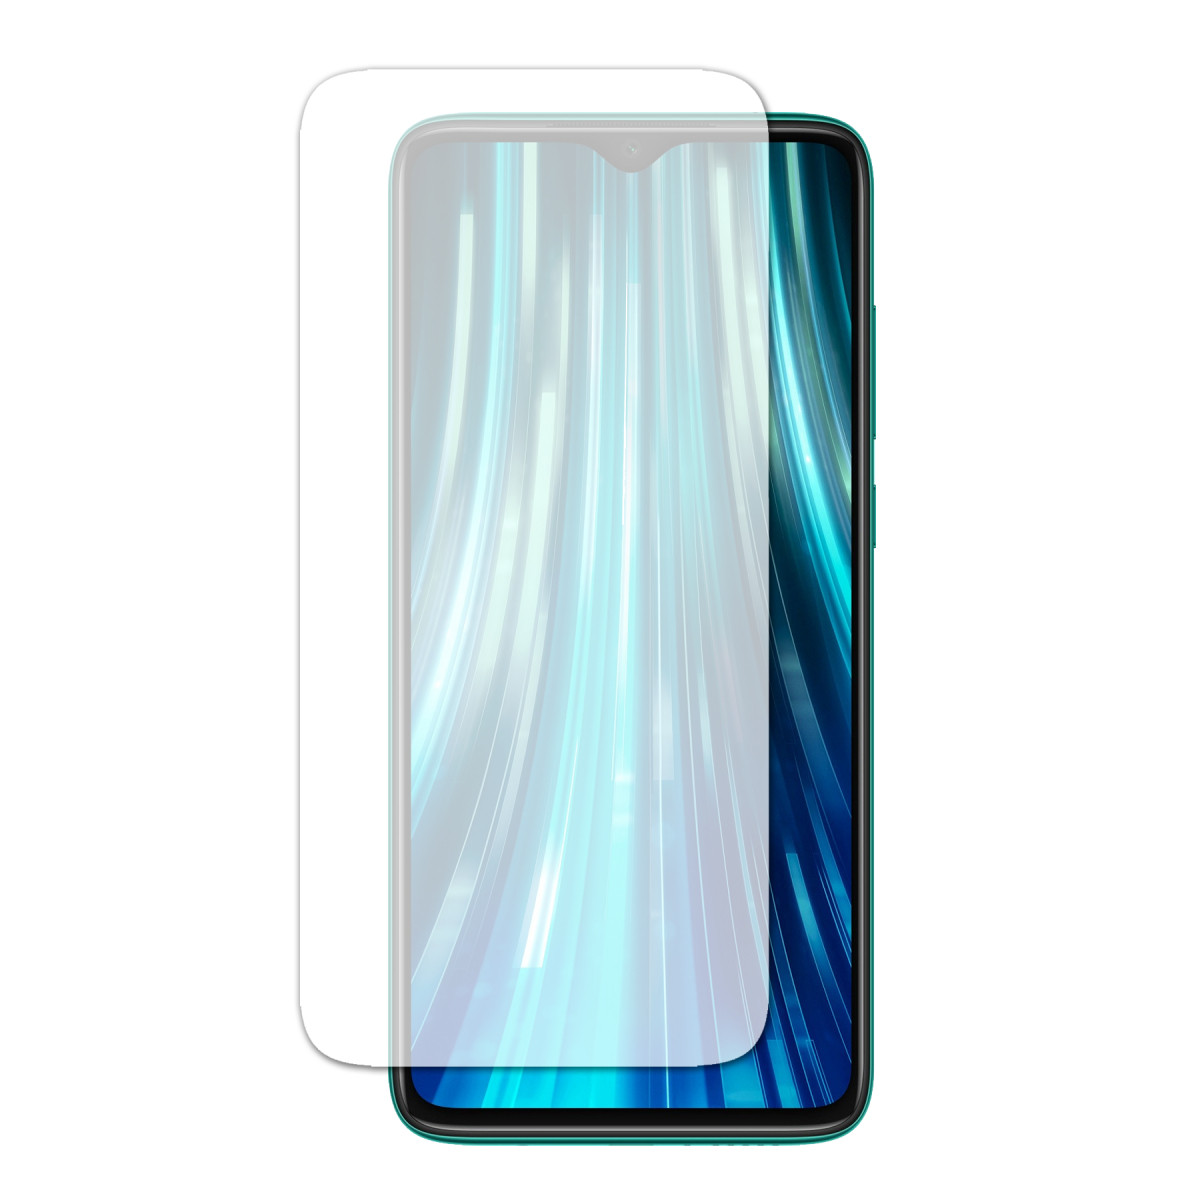 Гидрогелевая защитная пленка для смартфонов Xiaomi (Mi 10/Black Shark 3/Note 10 Lite/Mi 10 Pro/Poco F2